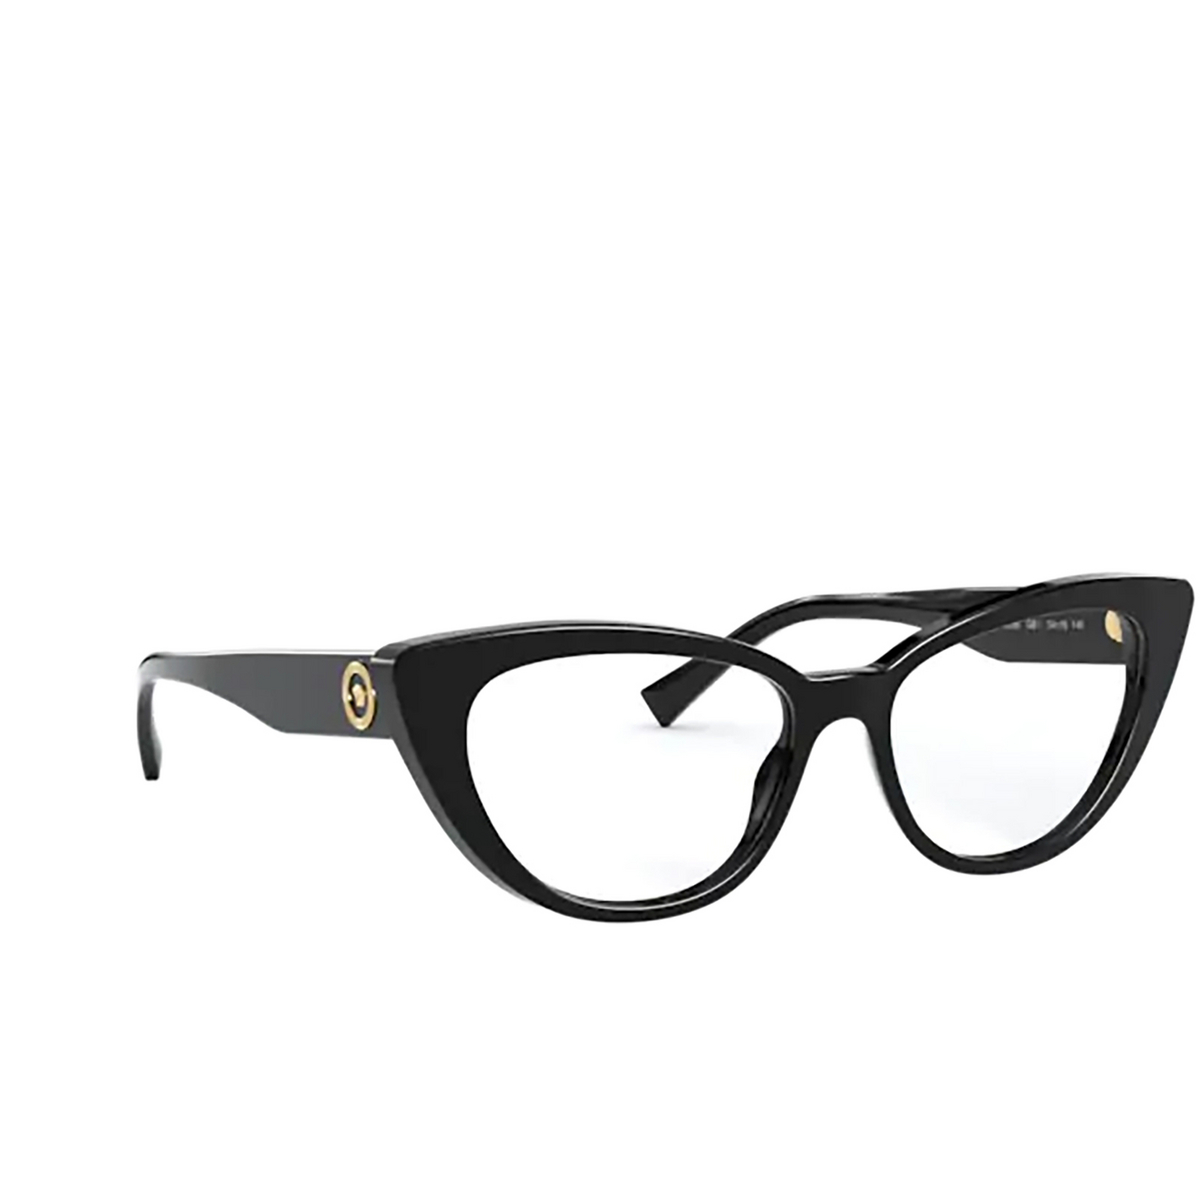 Versace® Cat-eye Eyeglasses: VE3286 color Black GB1 - three-quarters view.